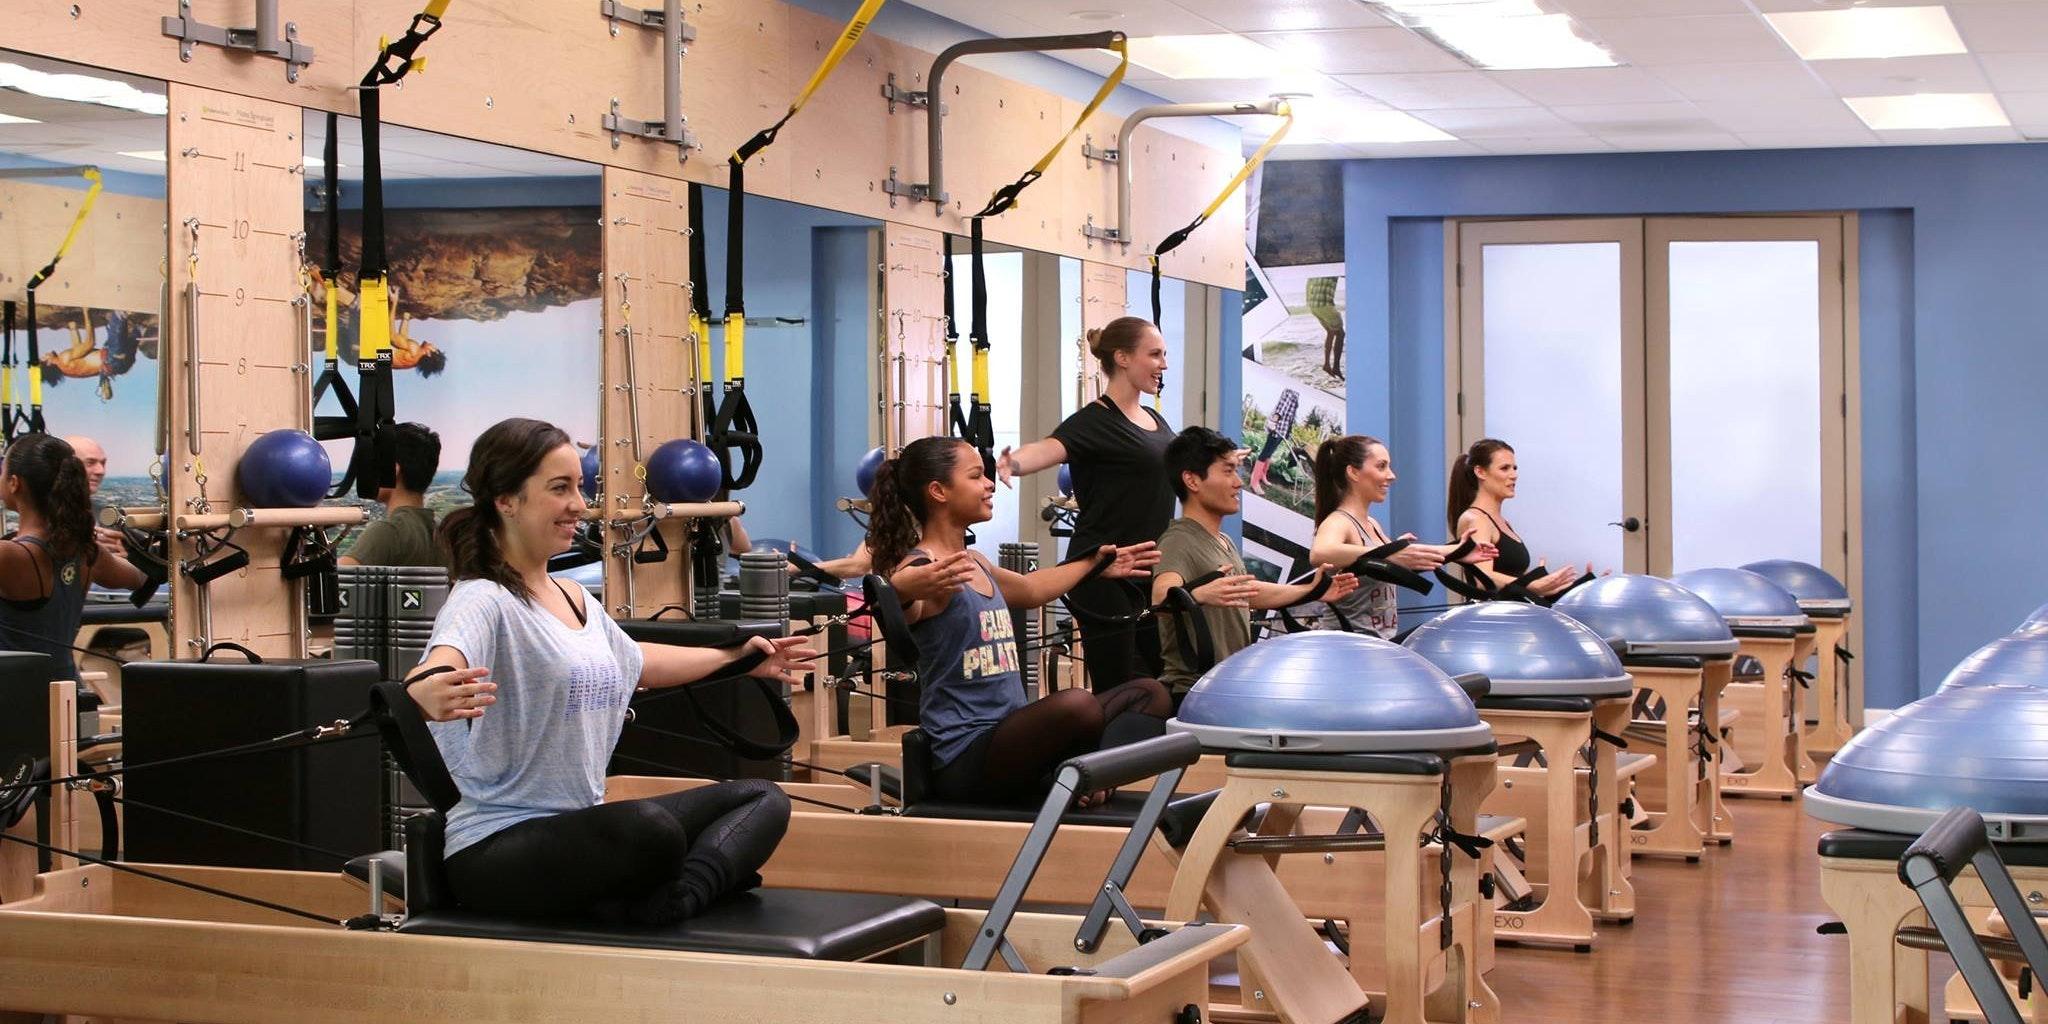 Club Pilates - South Miami